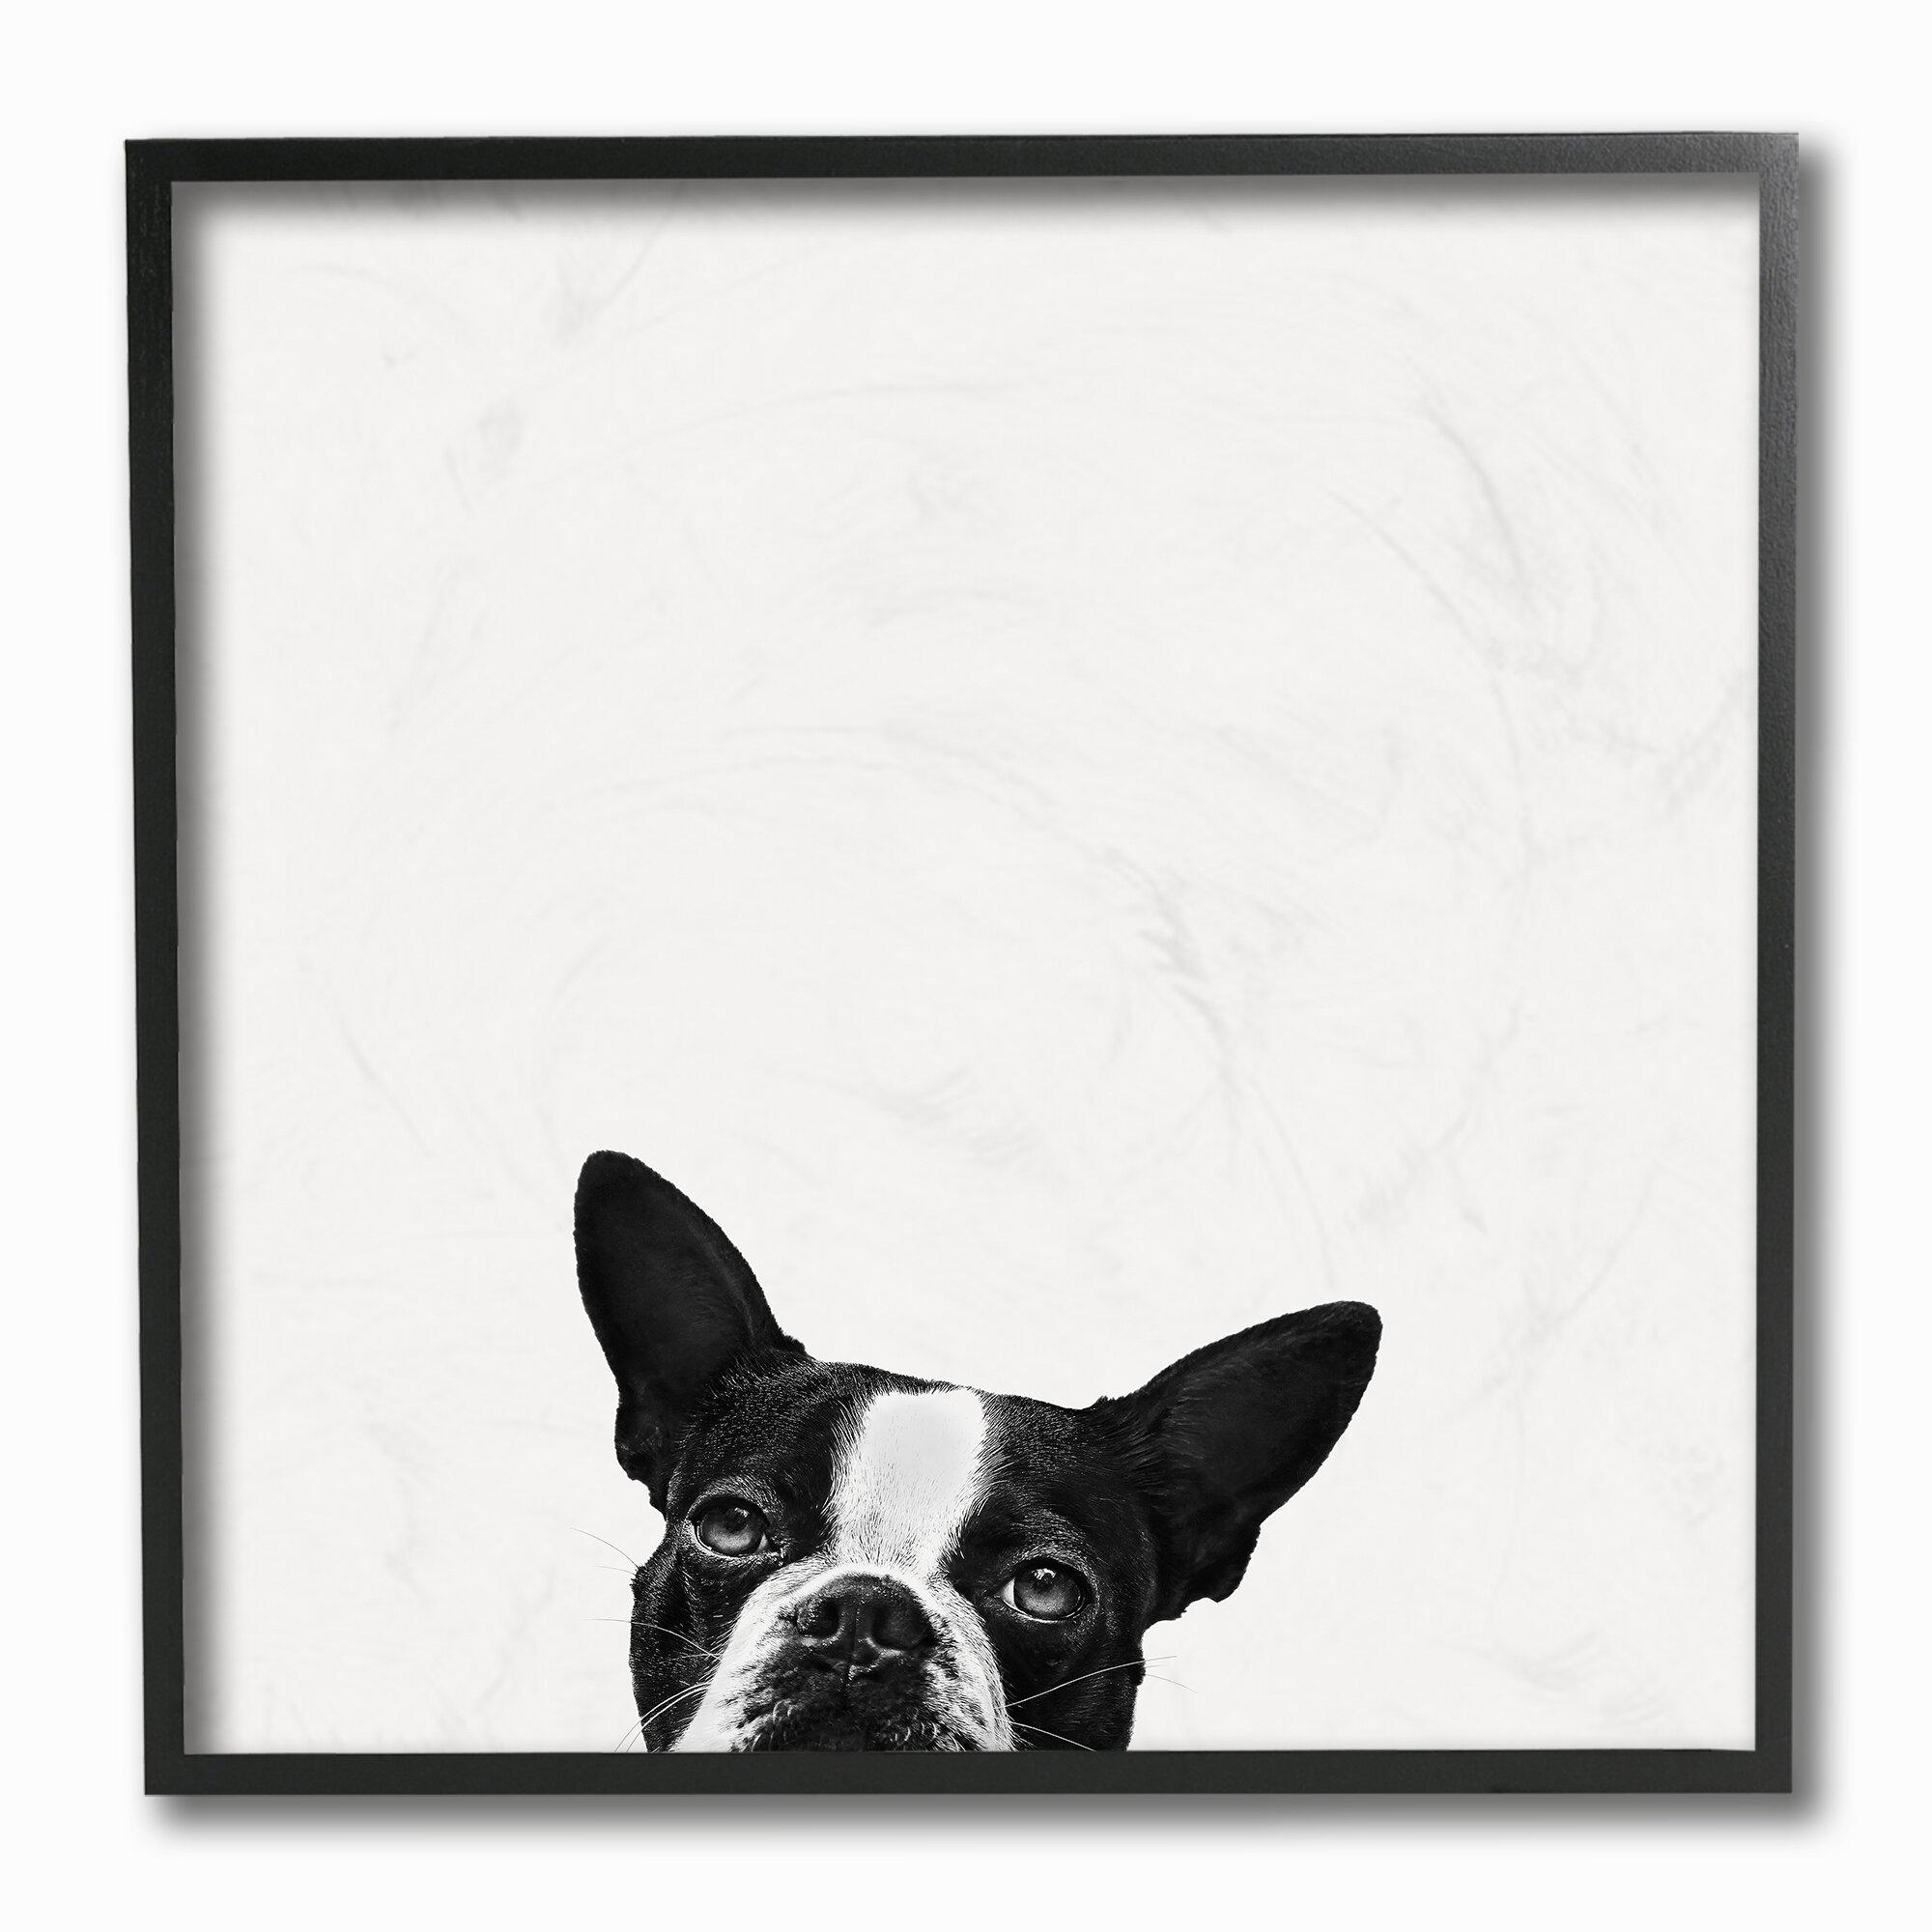 Winston Porter Minimal Monochrome Dog Peeking From Below By Jon Bertelli Photograph Print Wayfair